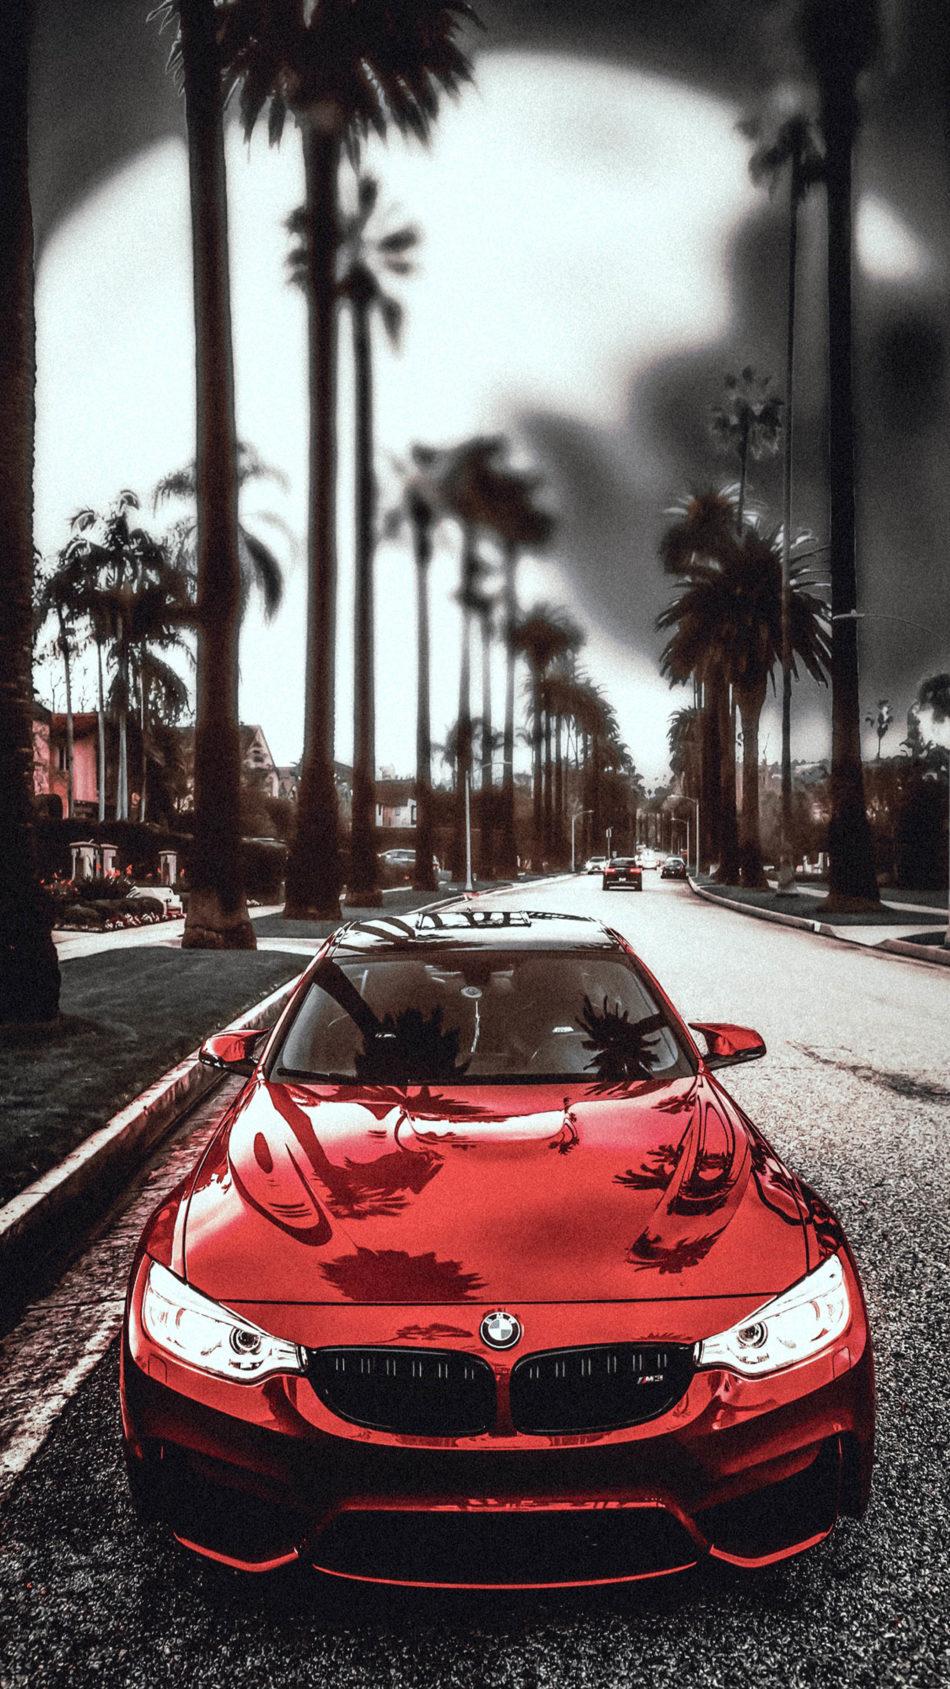 BMW M3 Red 4K Ultra HD Mobile Wallpaper